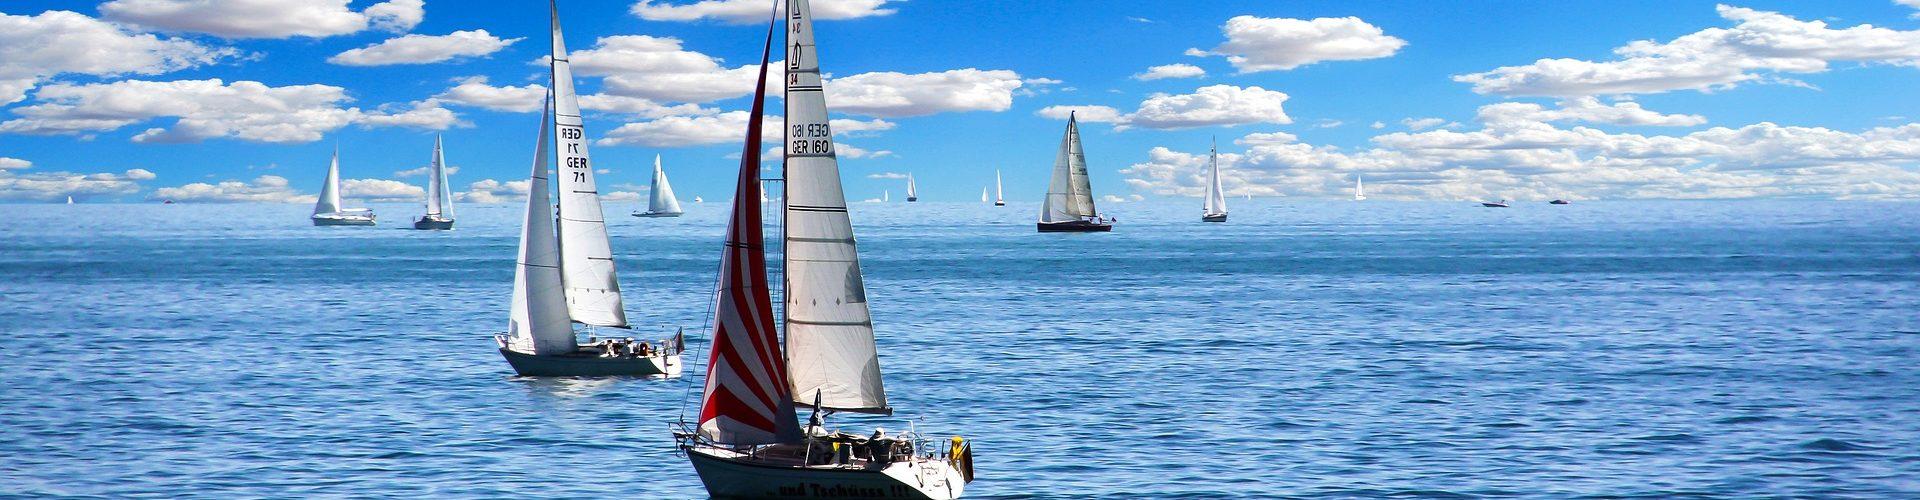 segeln lernen in Hamburg Moorfleet segelschein machen in Hamburg Moorfleet 1920x500 - Segeln lernen in Hamburg Moorfleet